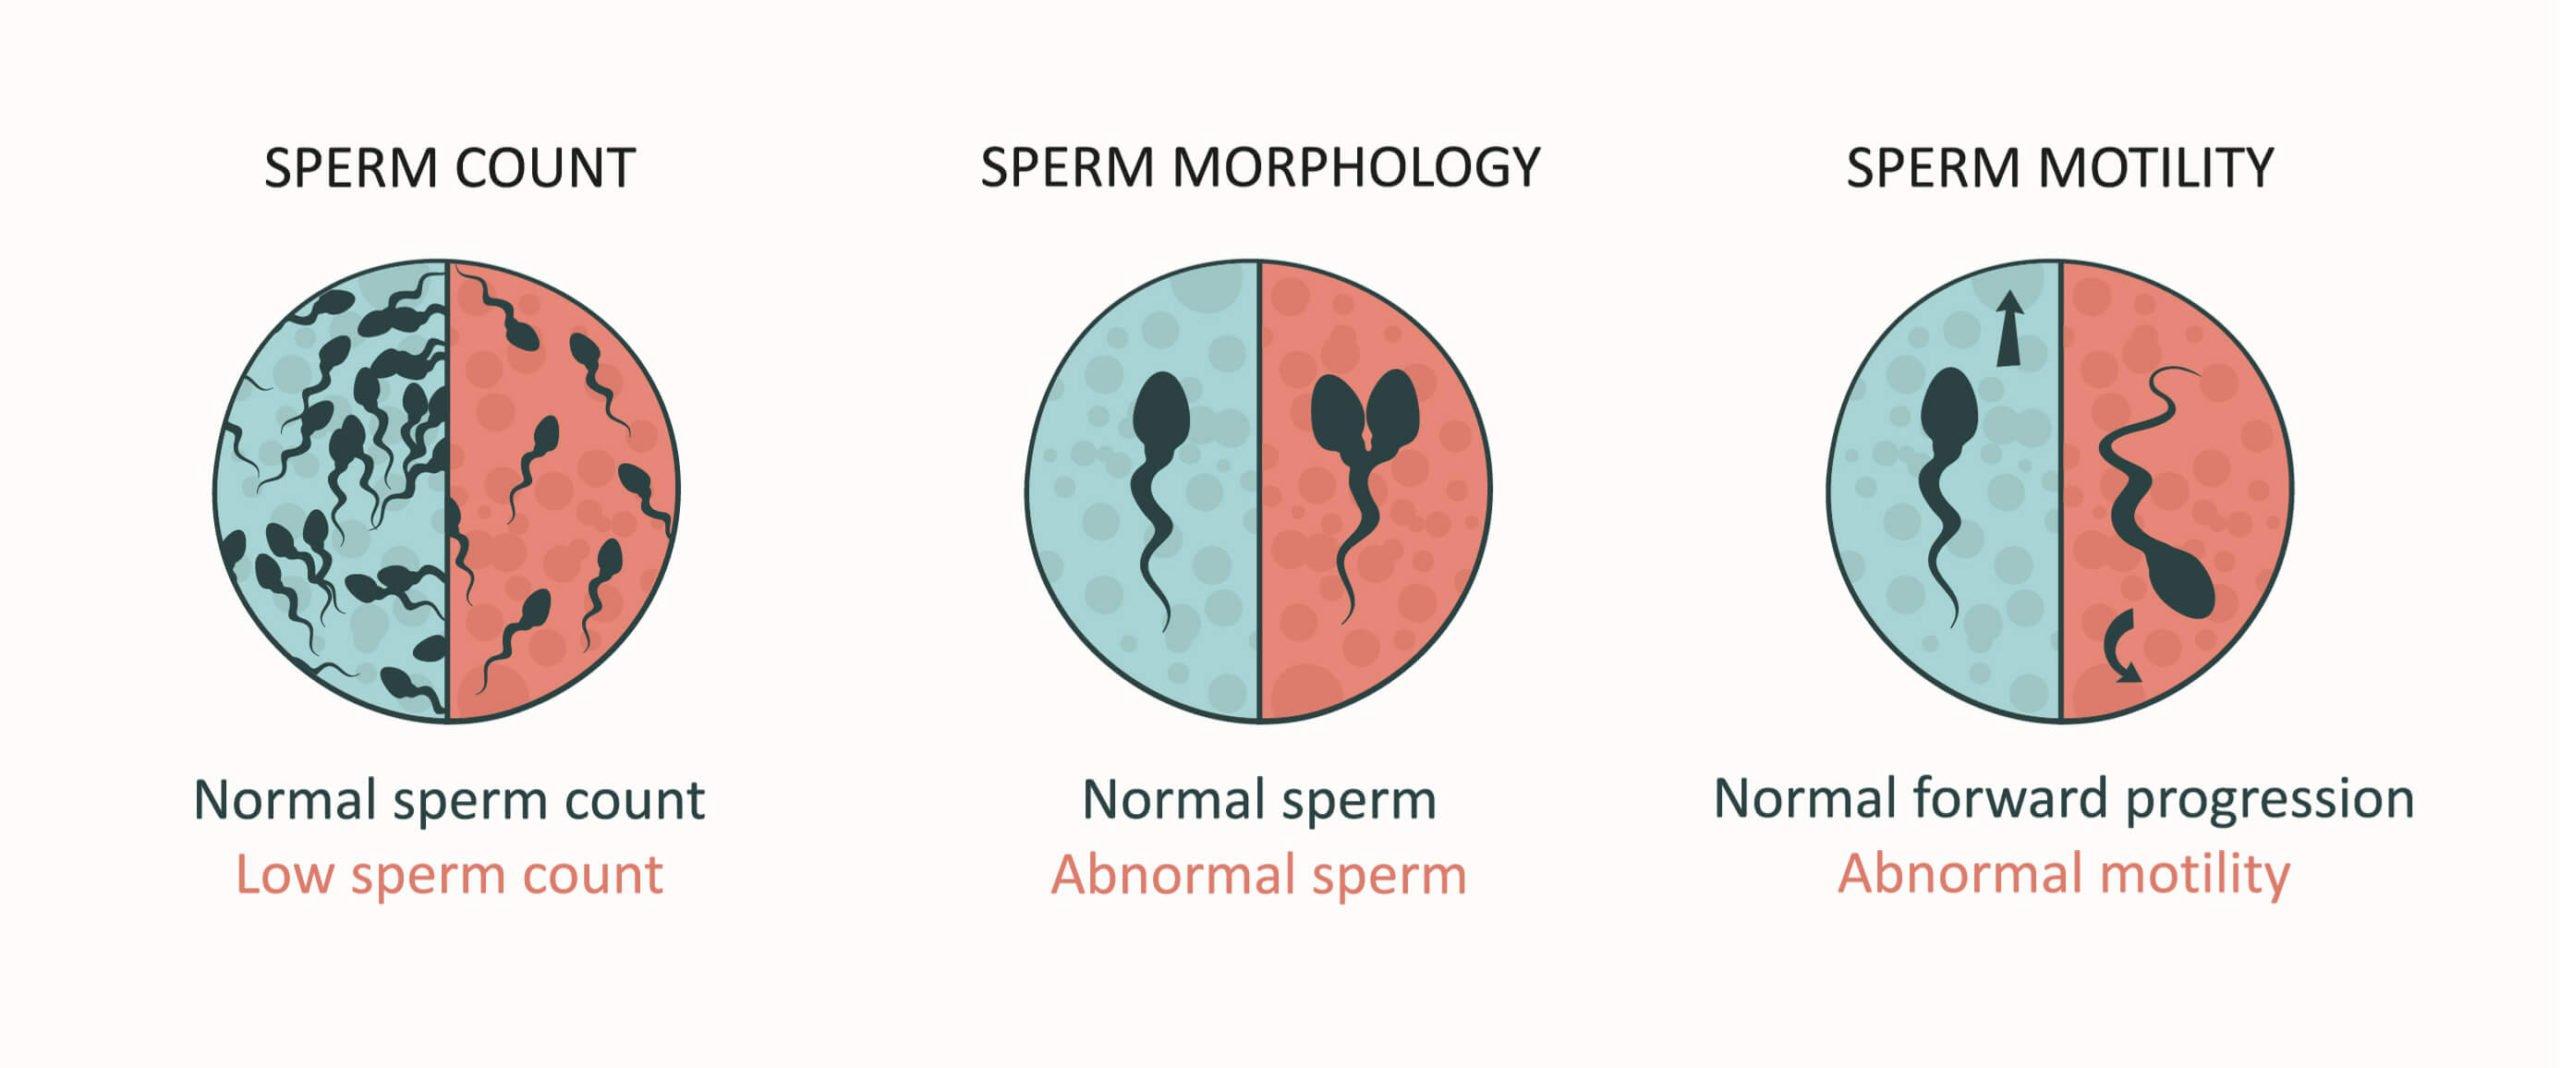 normal sperm count